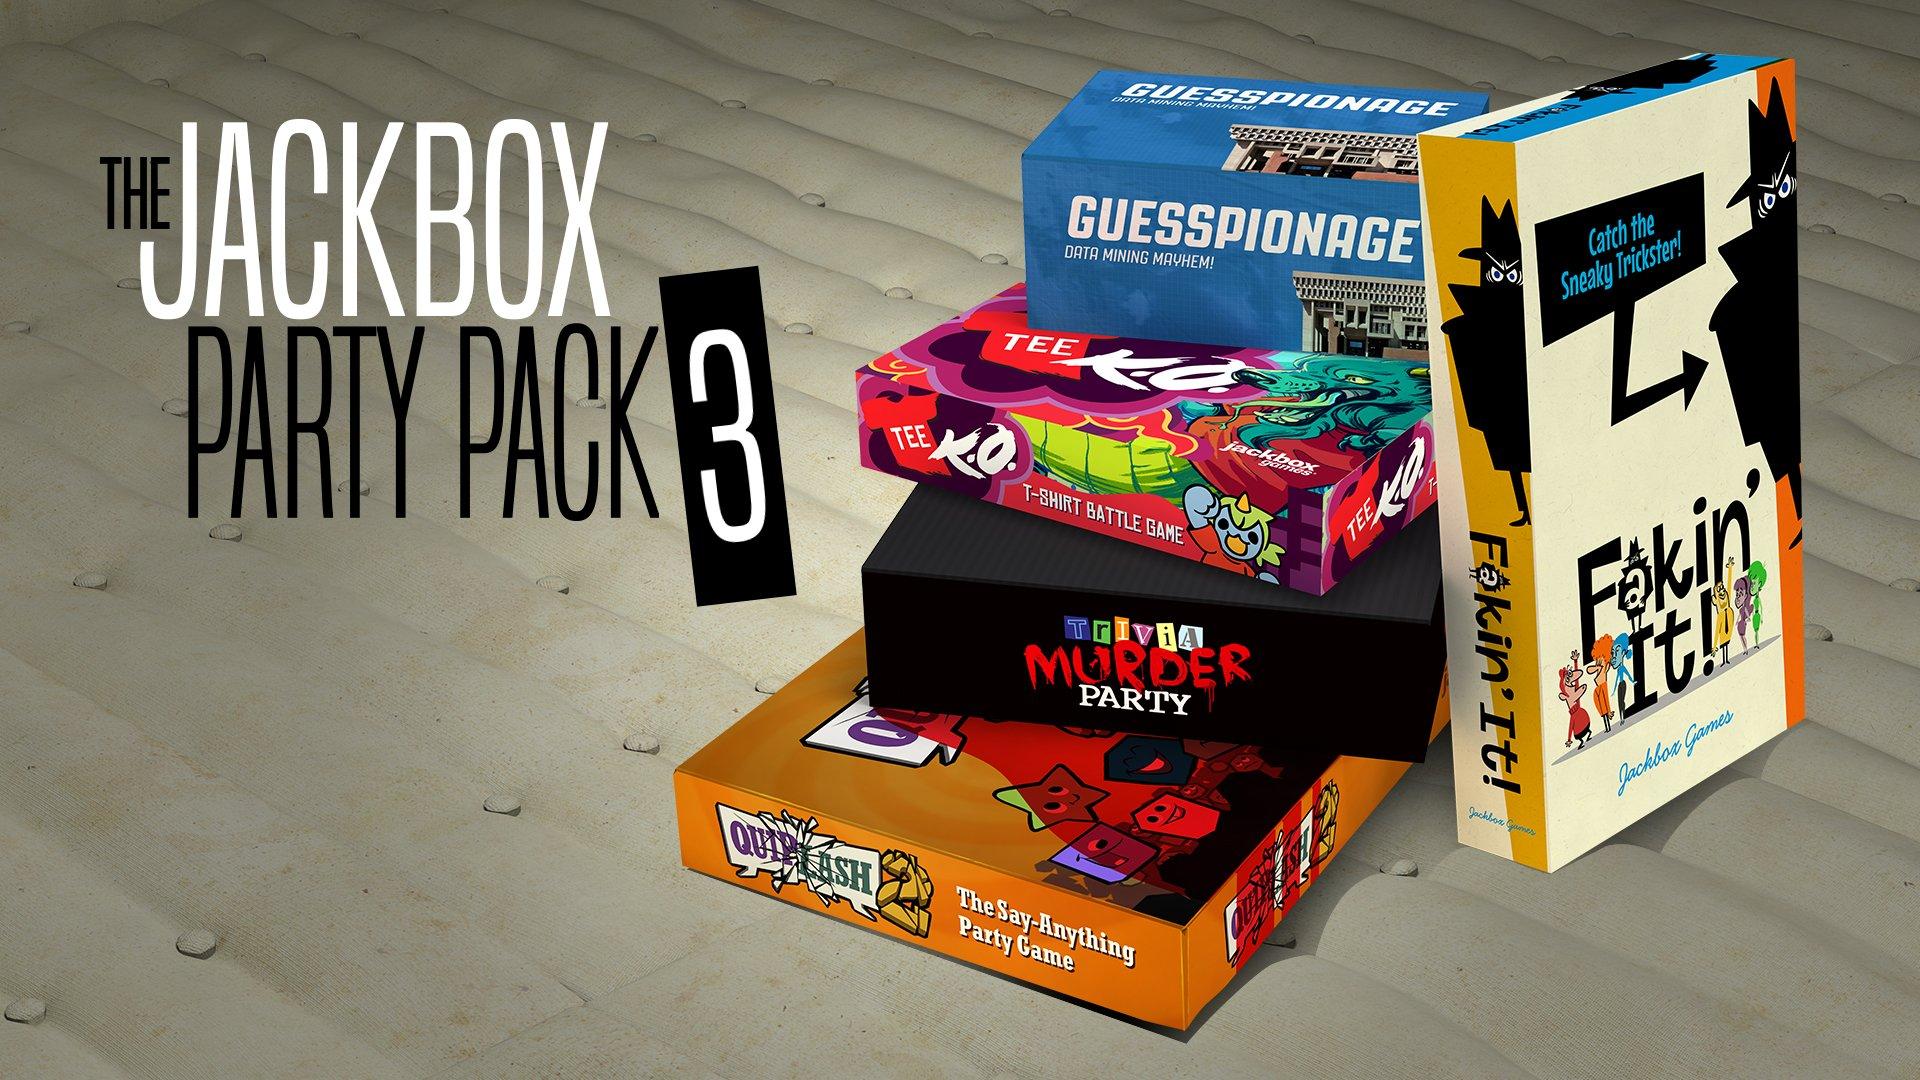 Amazon.com: The Jackbox Party Pack 3 - Nintendo Switch [Digital Code ...